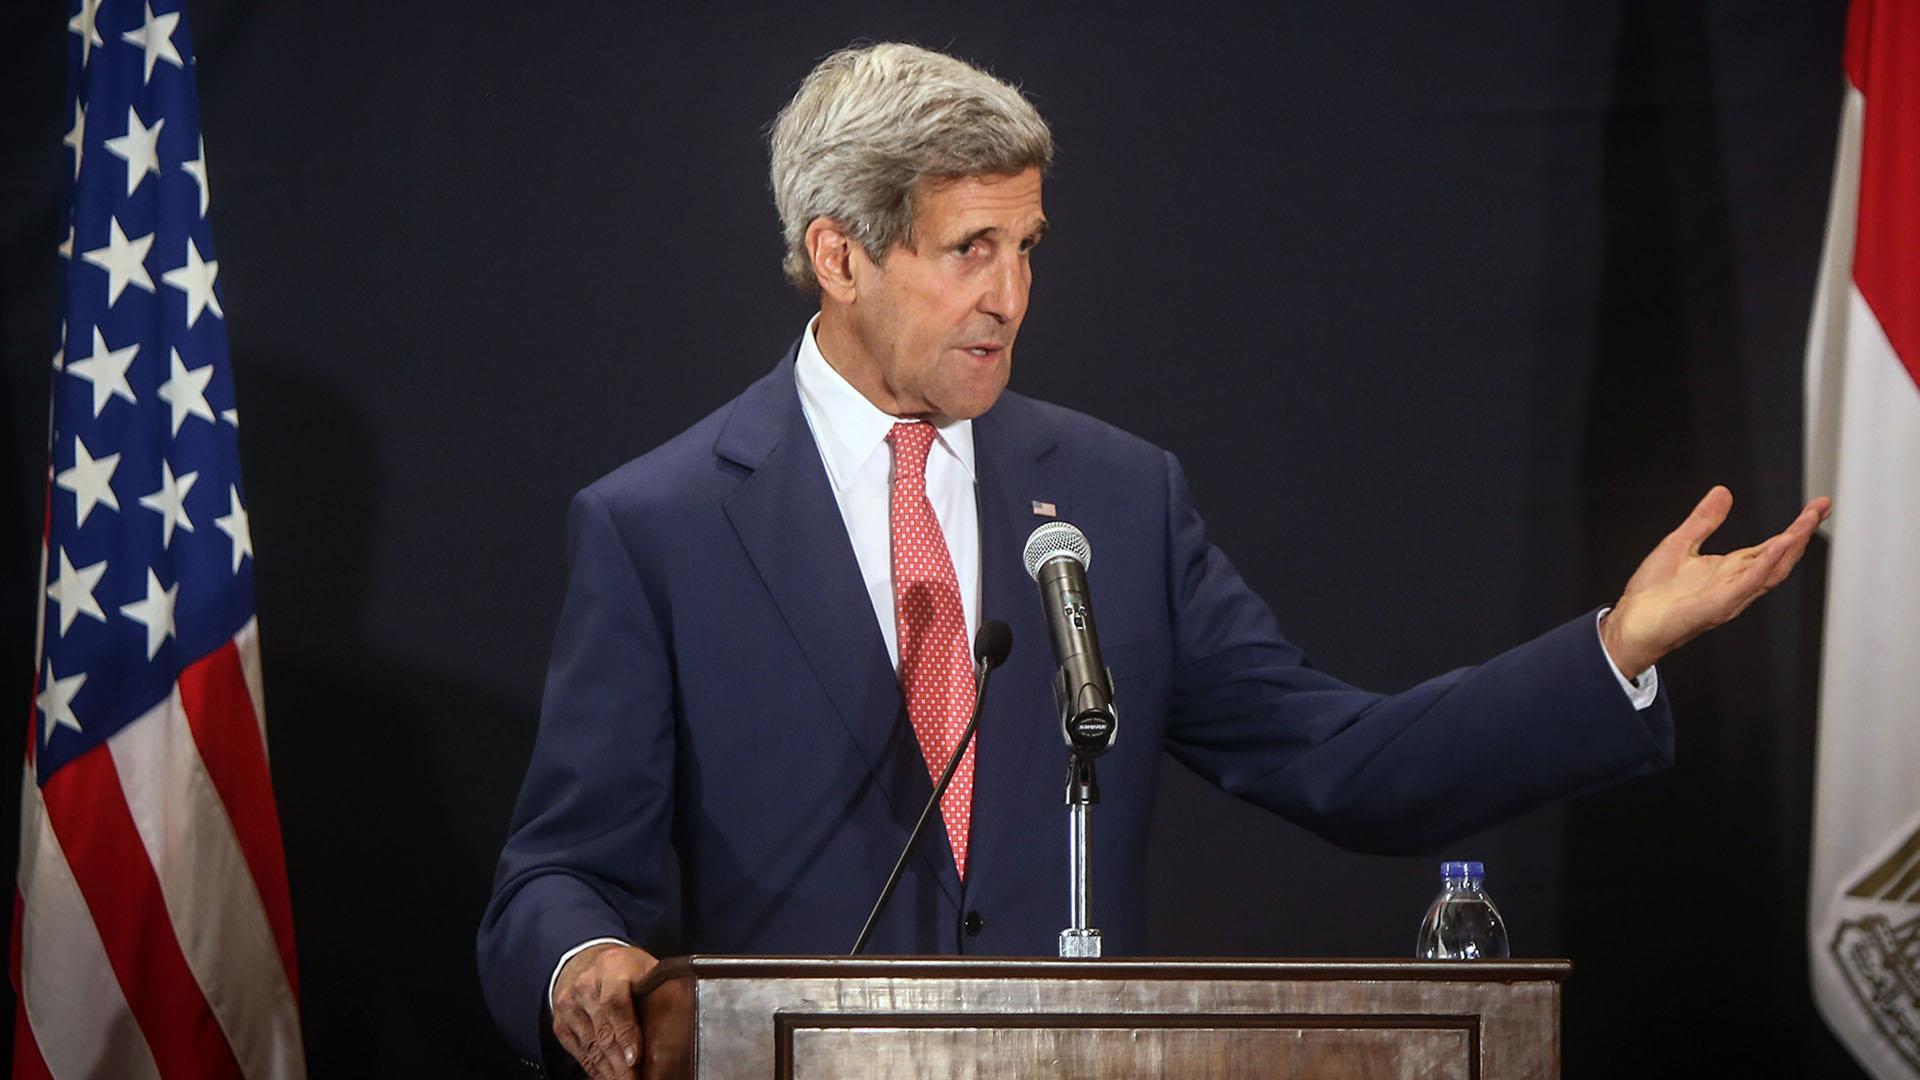 LIVE VIDEO: Kerry testifies on ISIS